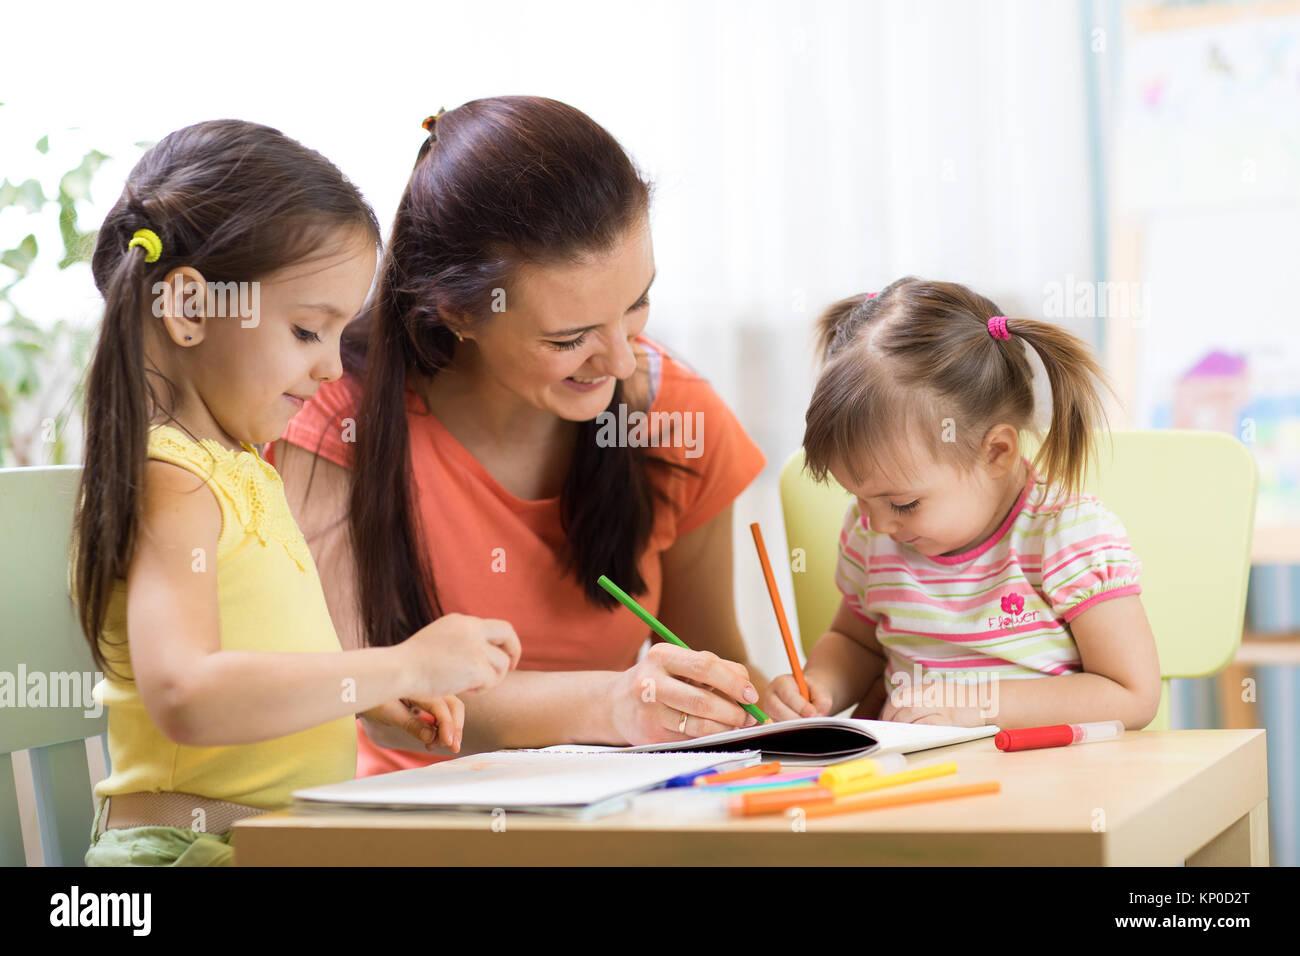 Teacher mom working with creative kids - Stock Image